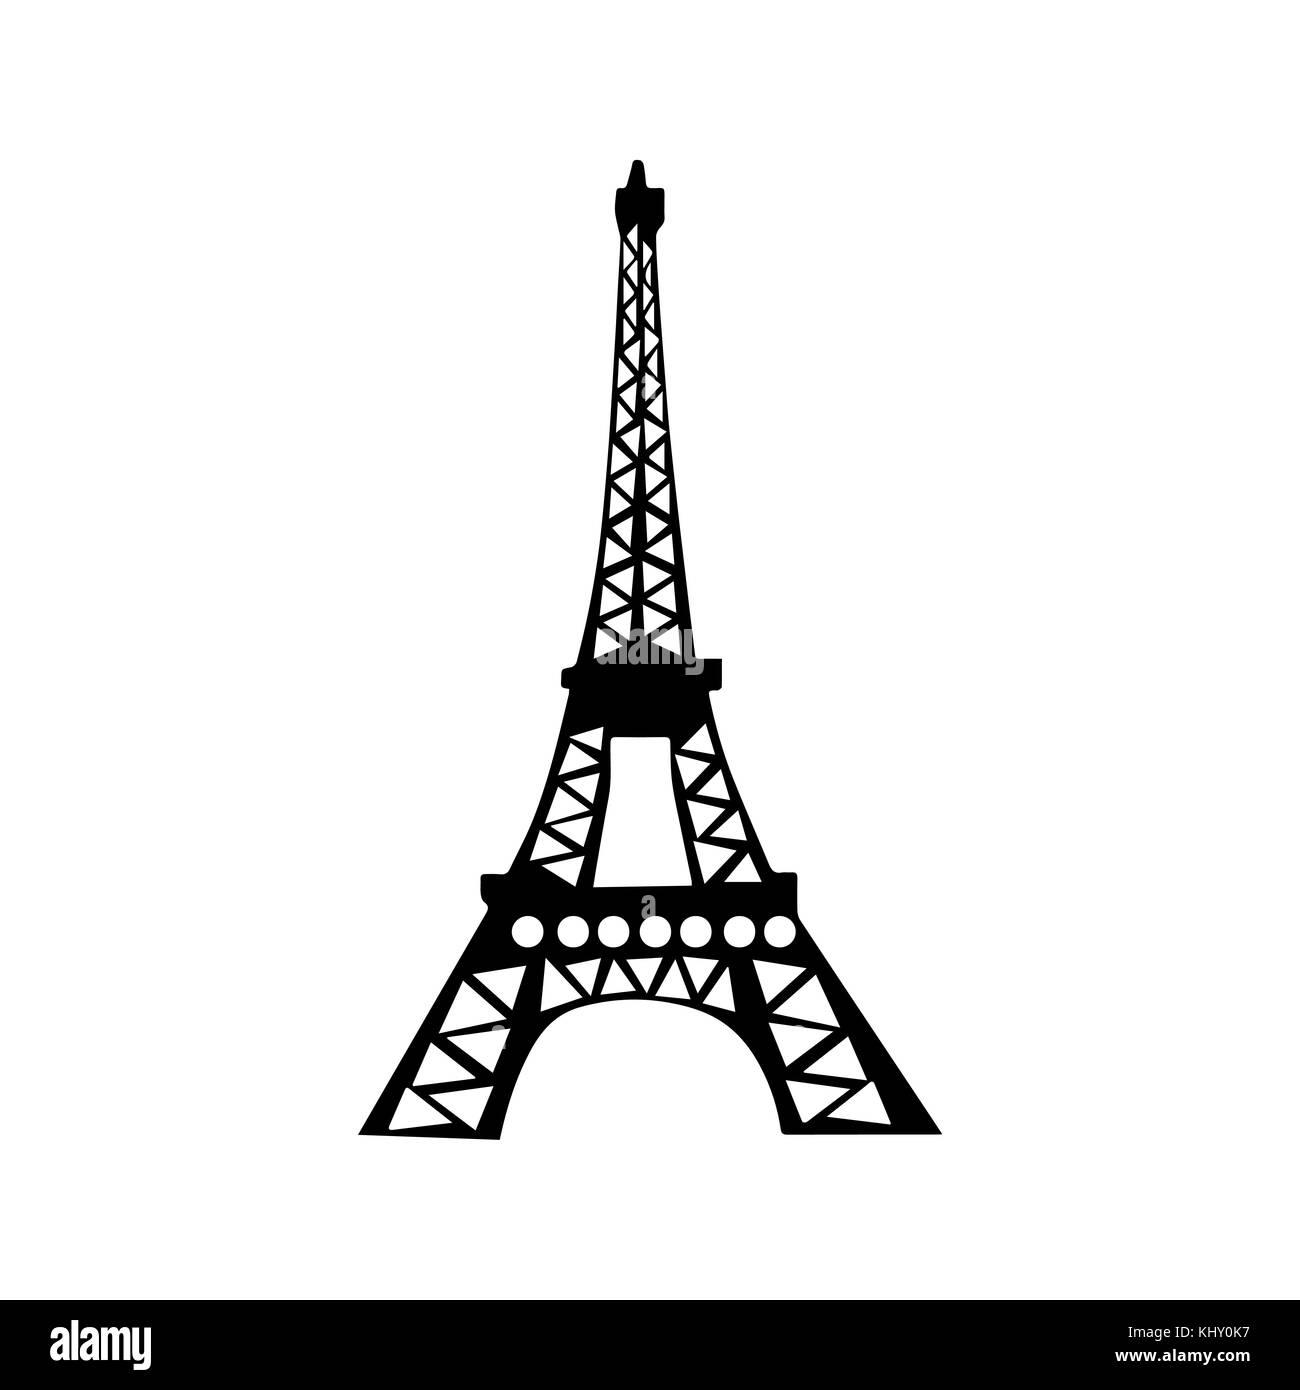 Eiffel Tower illustration - Stock Image